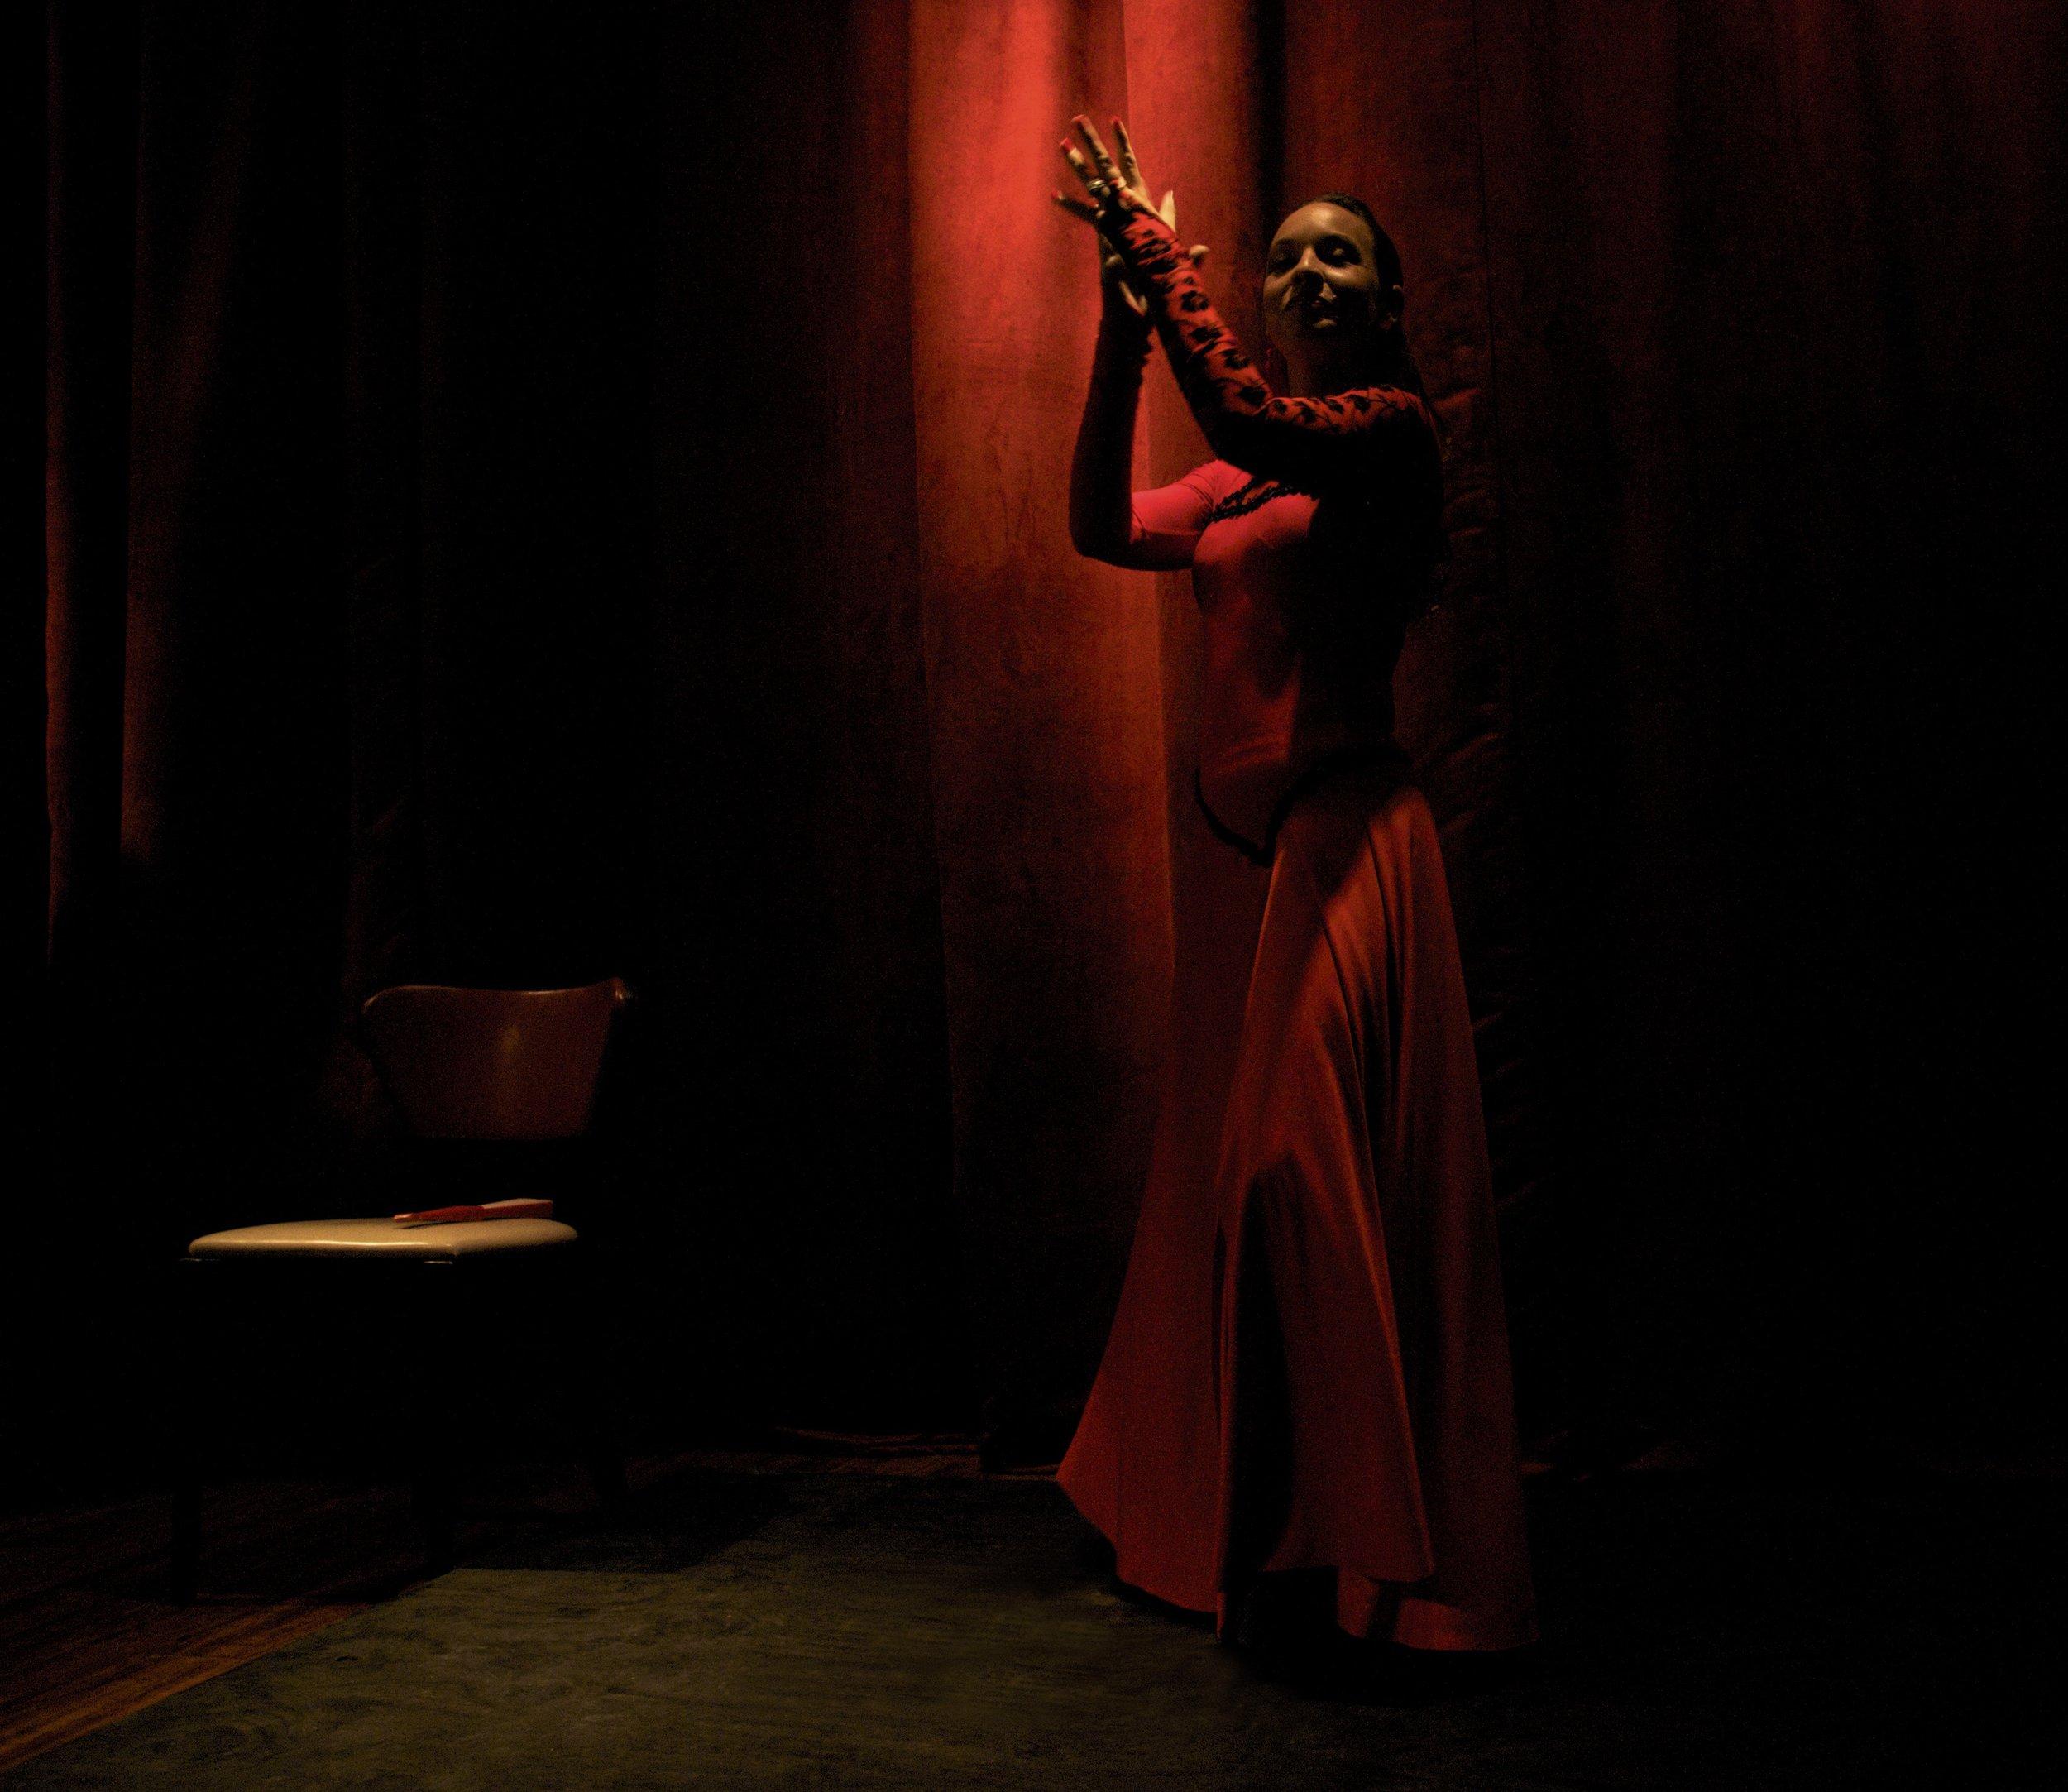 vanessa-flamenco-dancer-saint-petersburg-florida-722.jpg